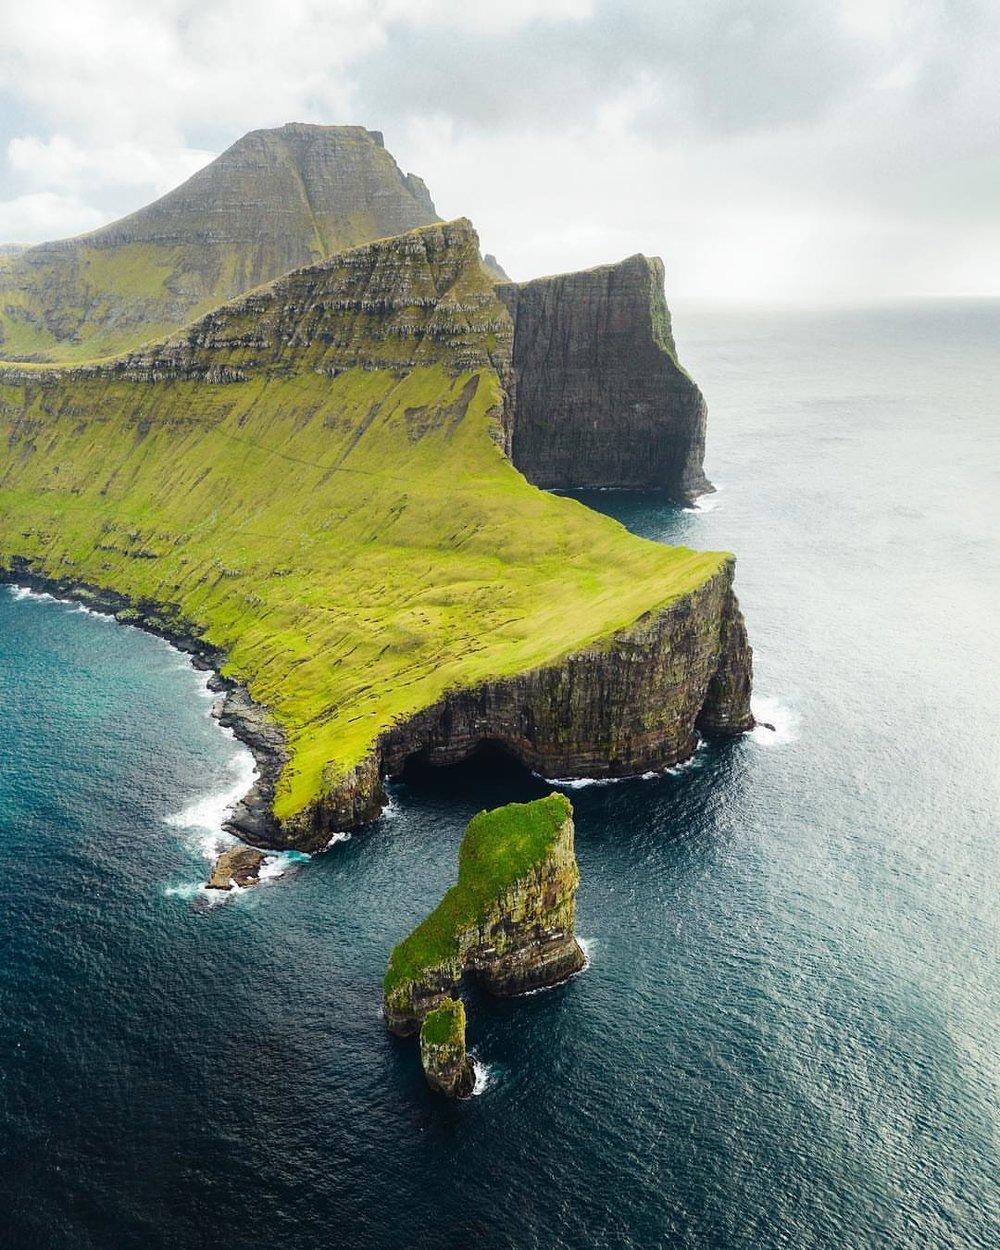 landscape_drone_photograhy_15.jpg